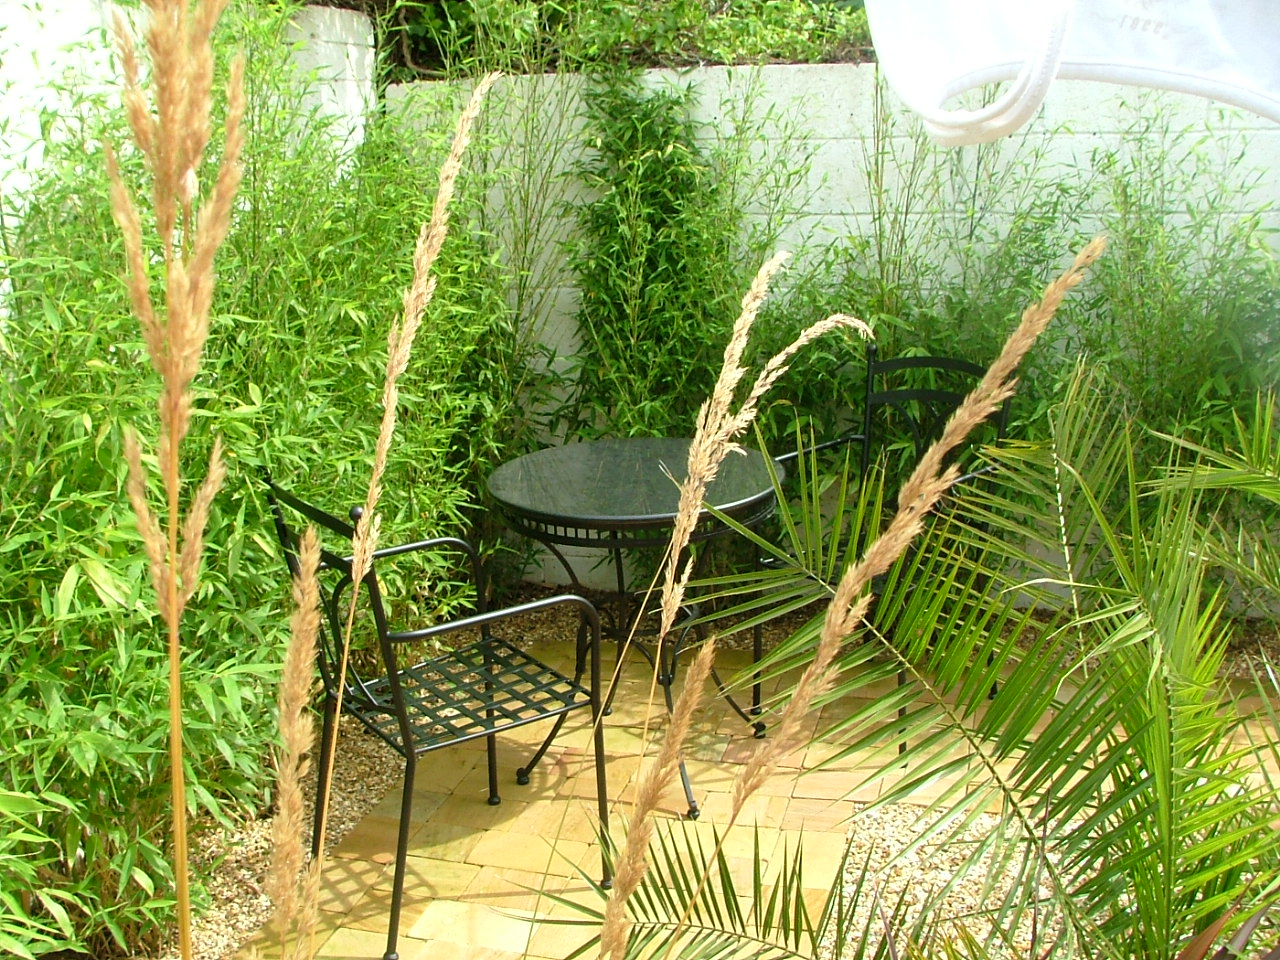 gat the garden in groove...